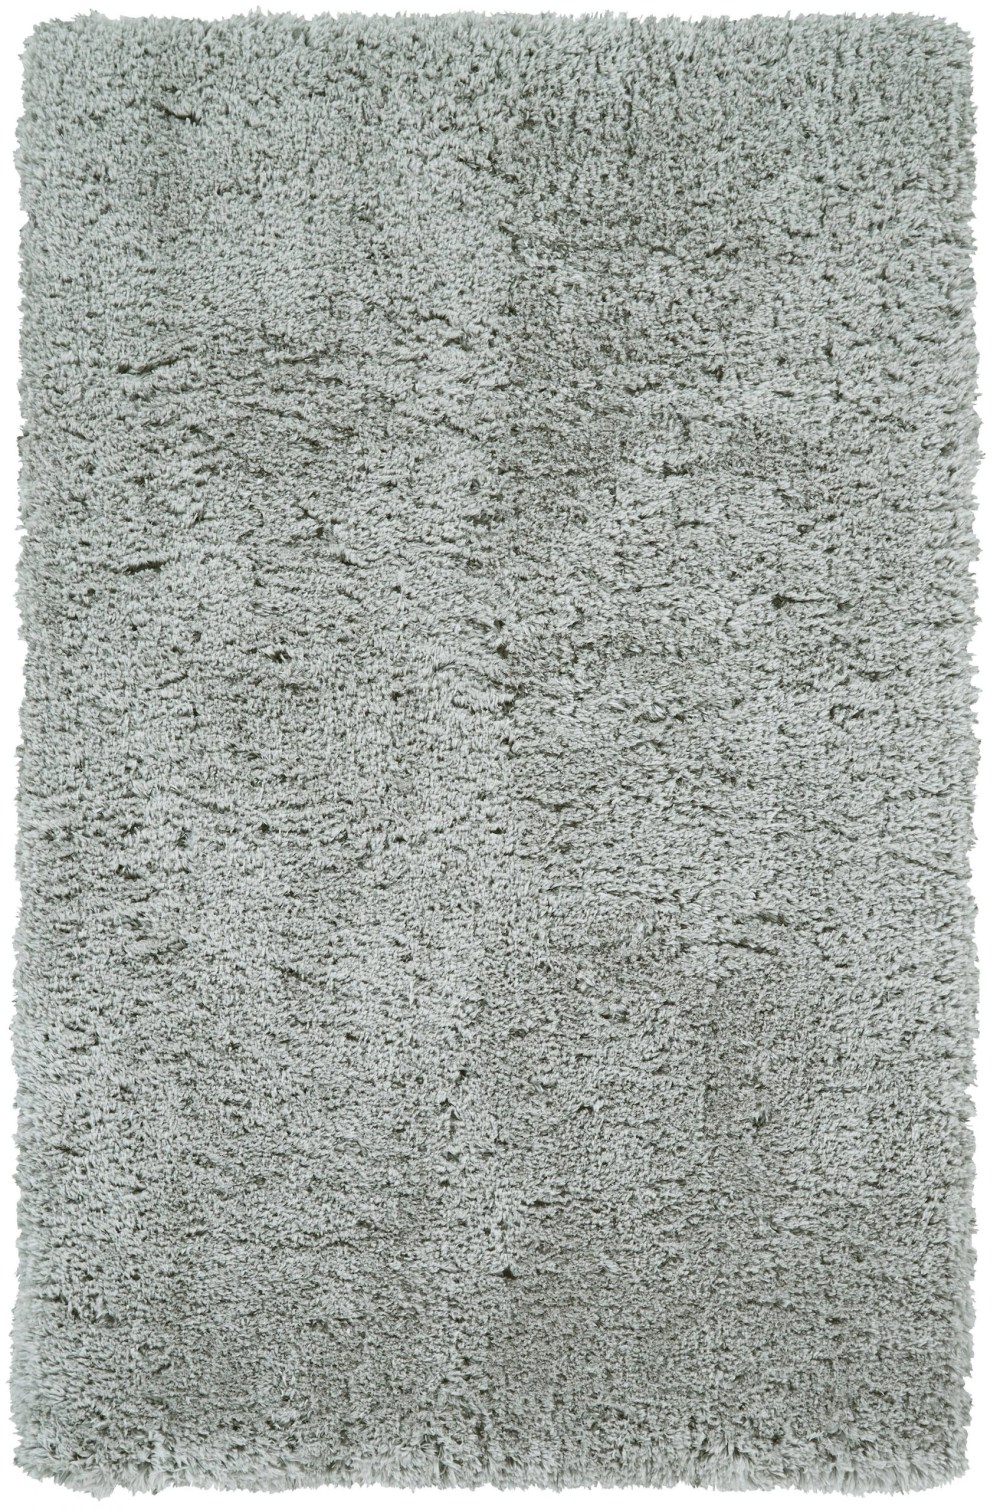 barry-rug-1